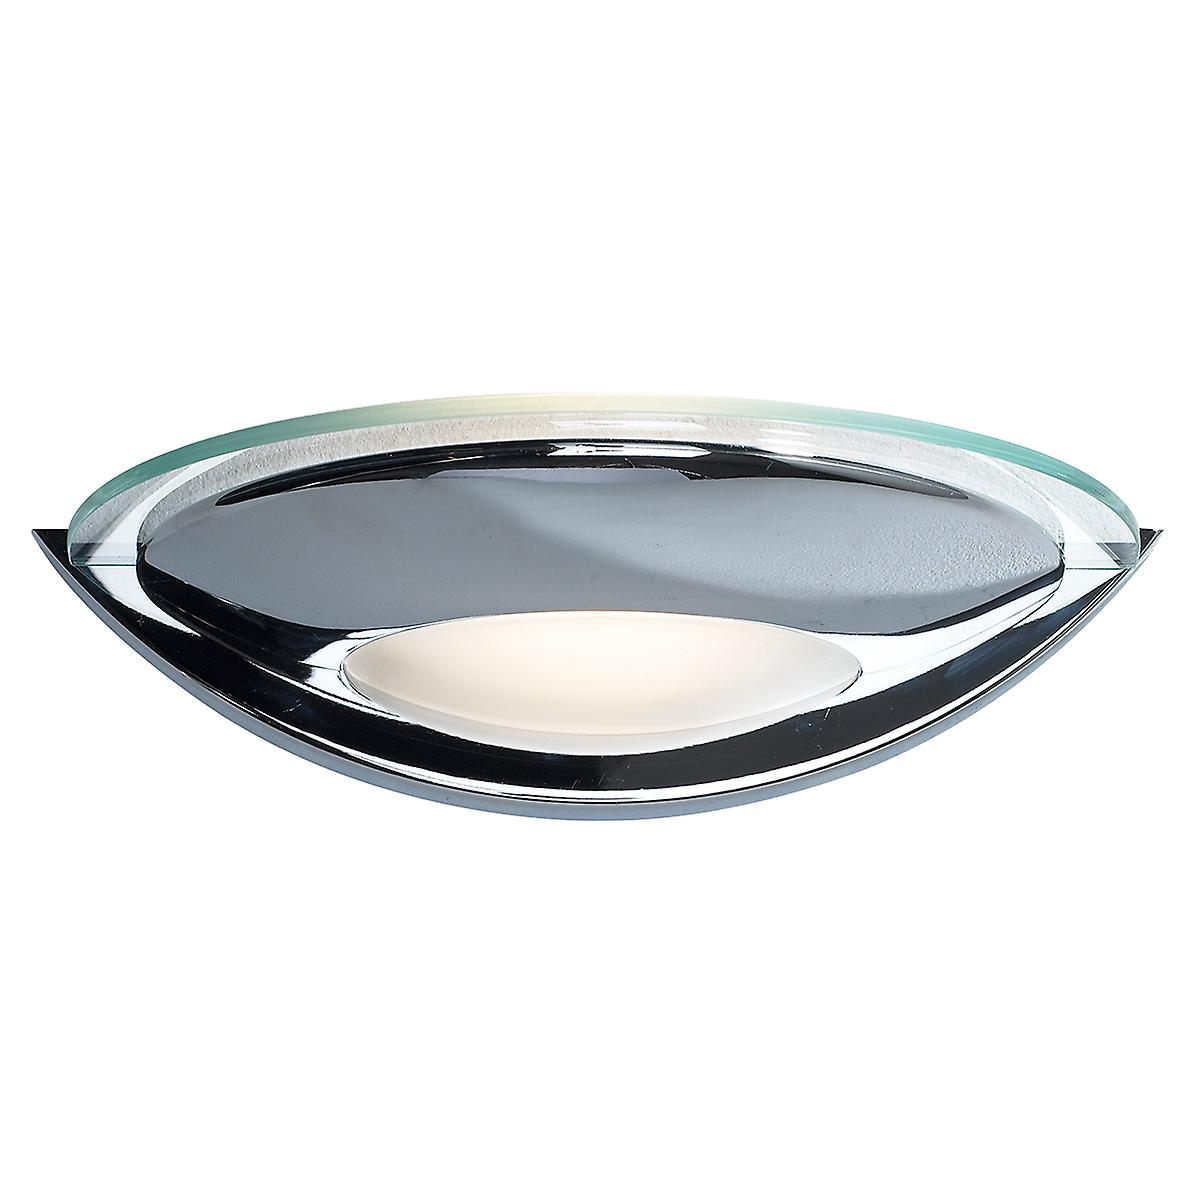 Dar VIA0750 Via Contemporary Single Wall Light With A Polished Chrome Finish